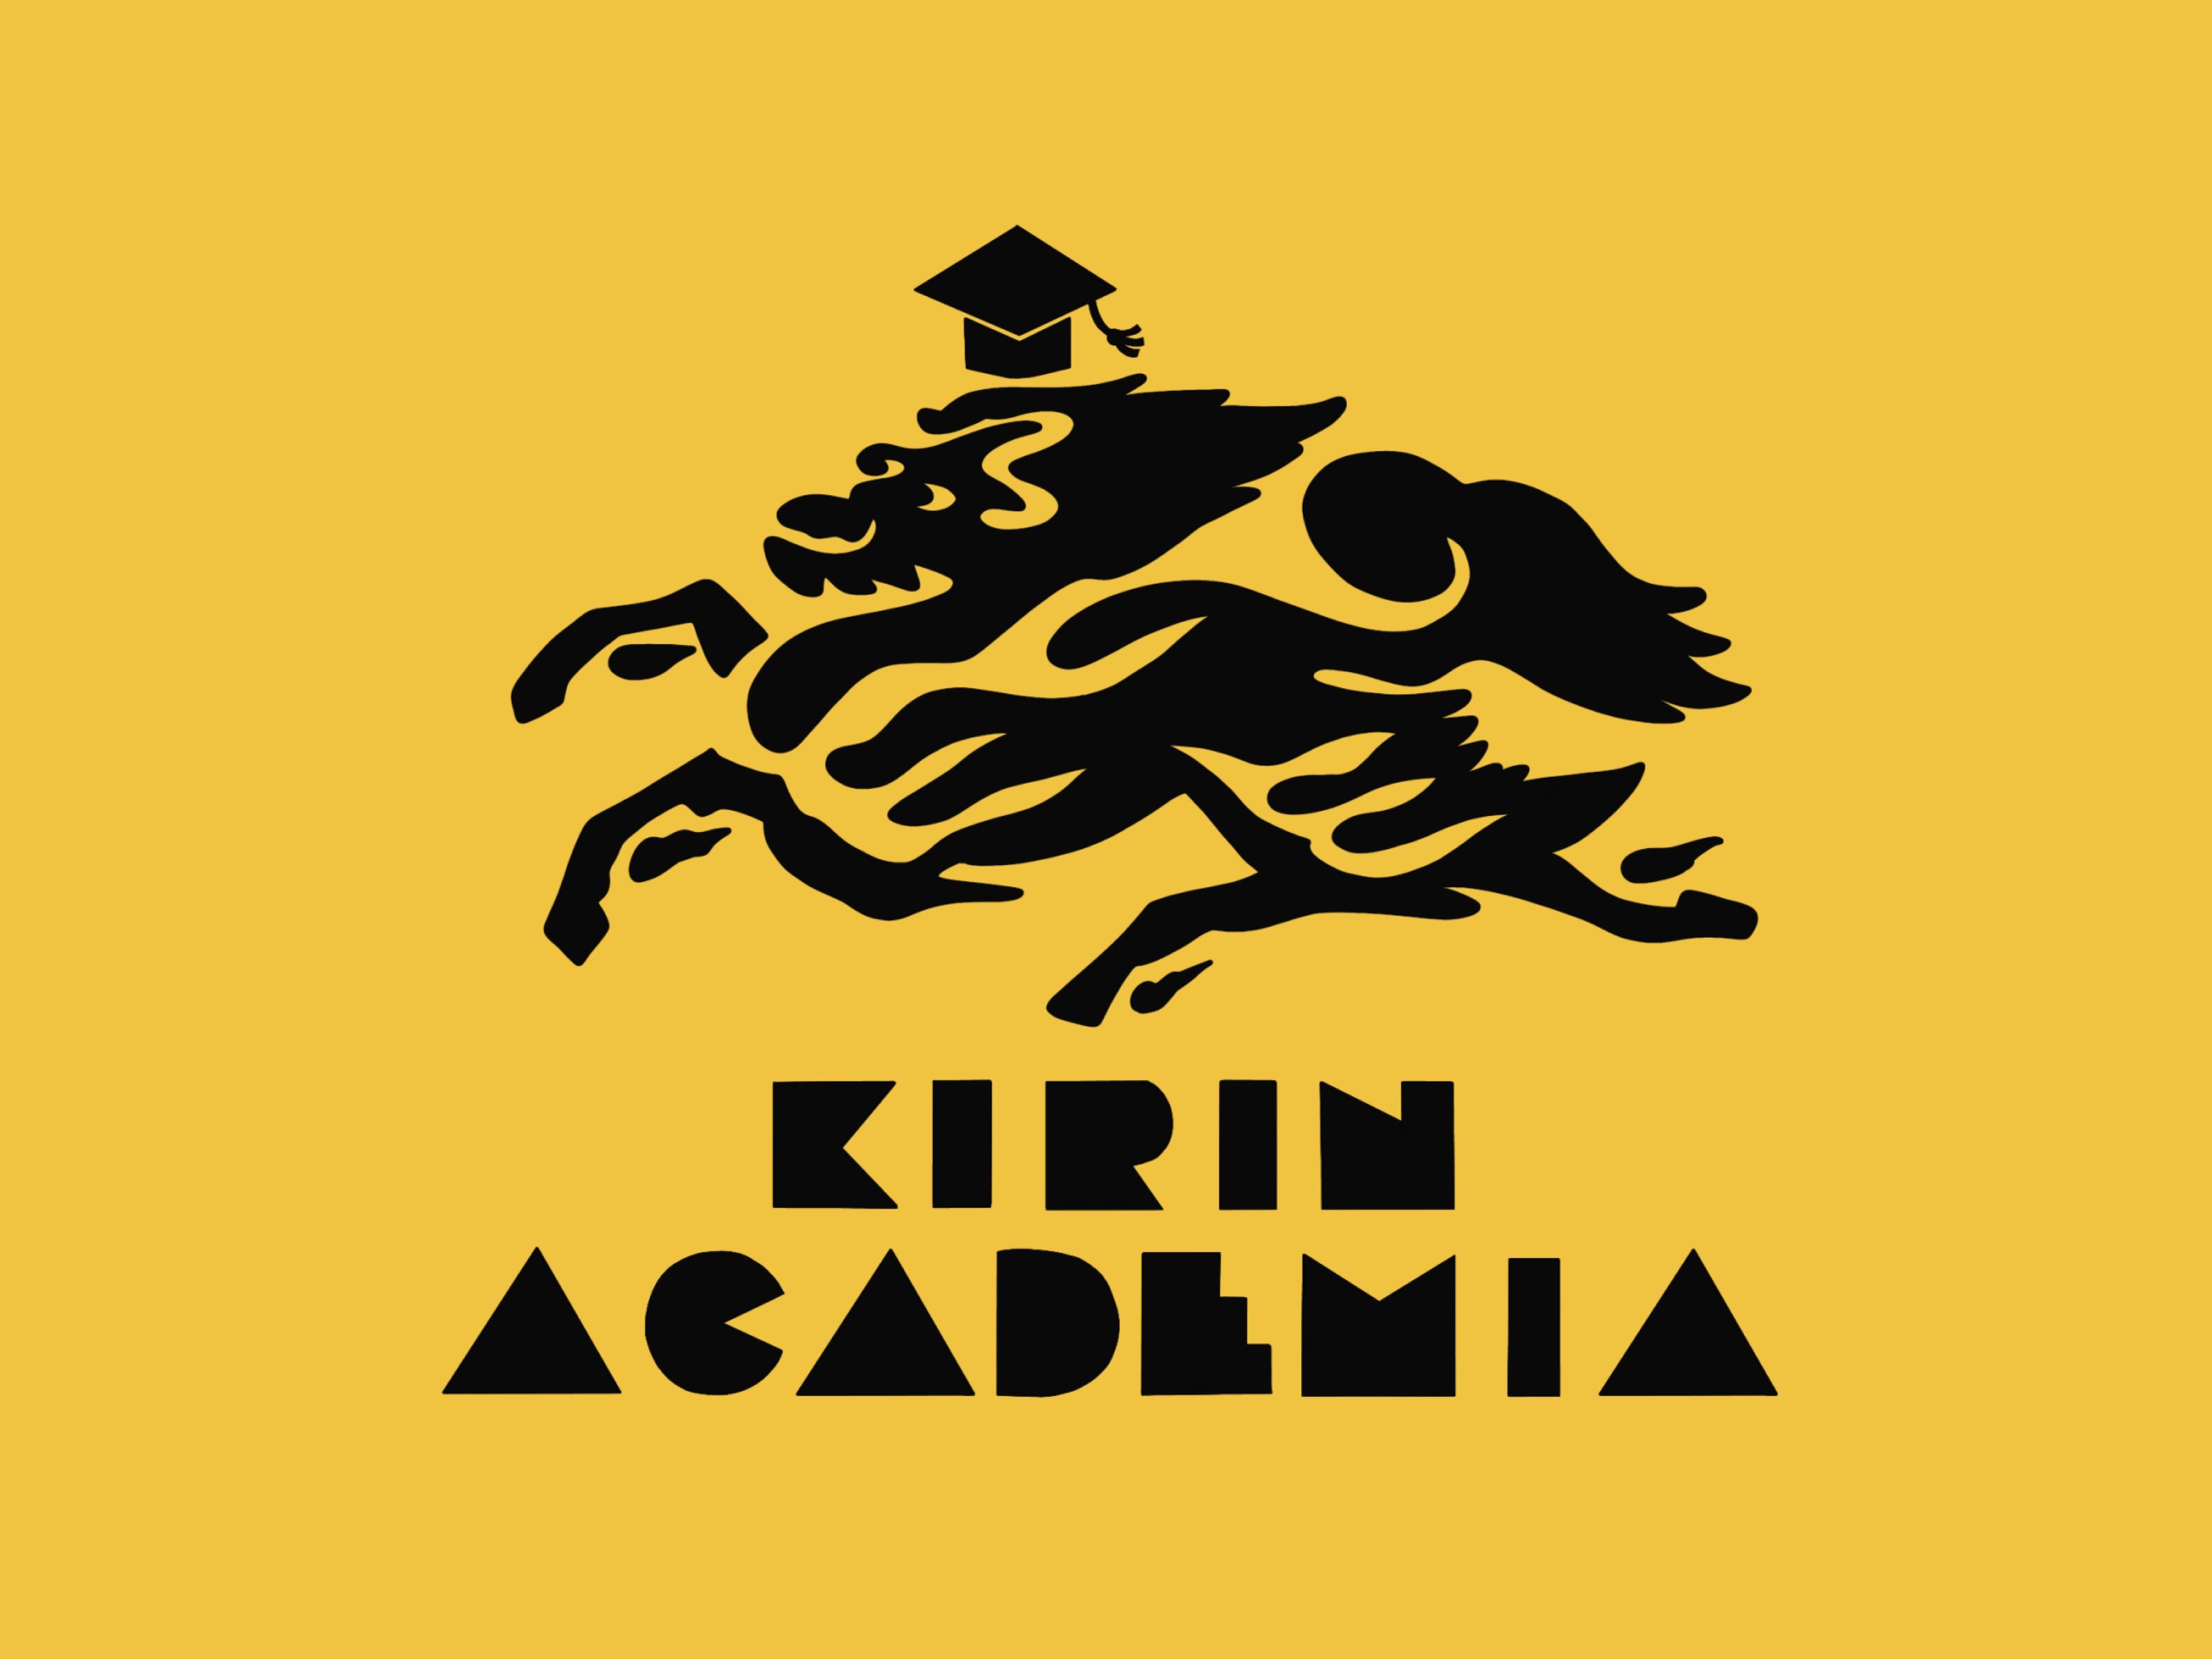 kirin_academia_logo